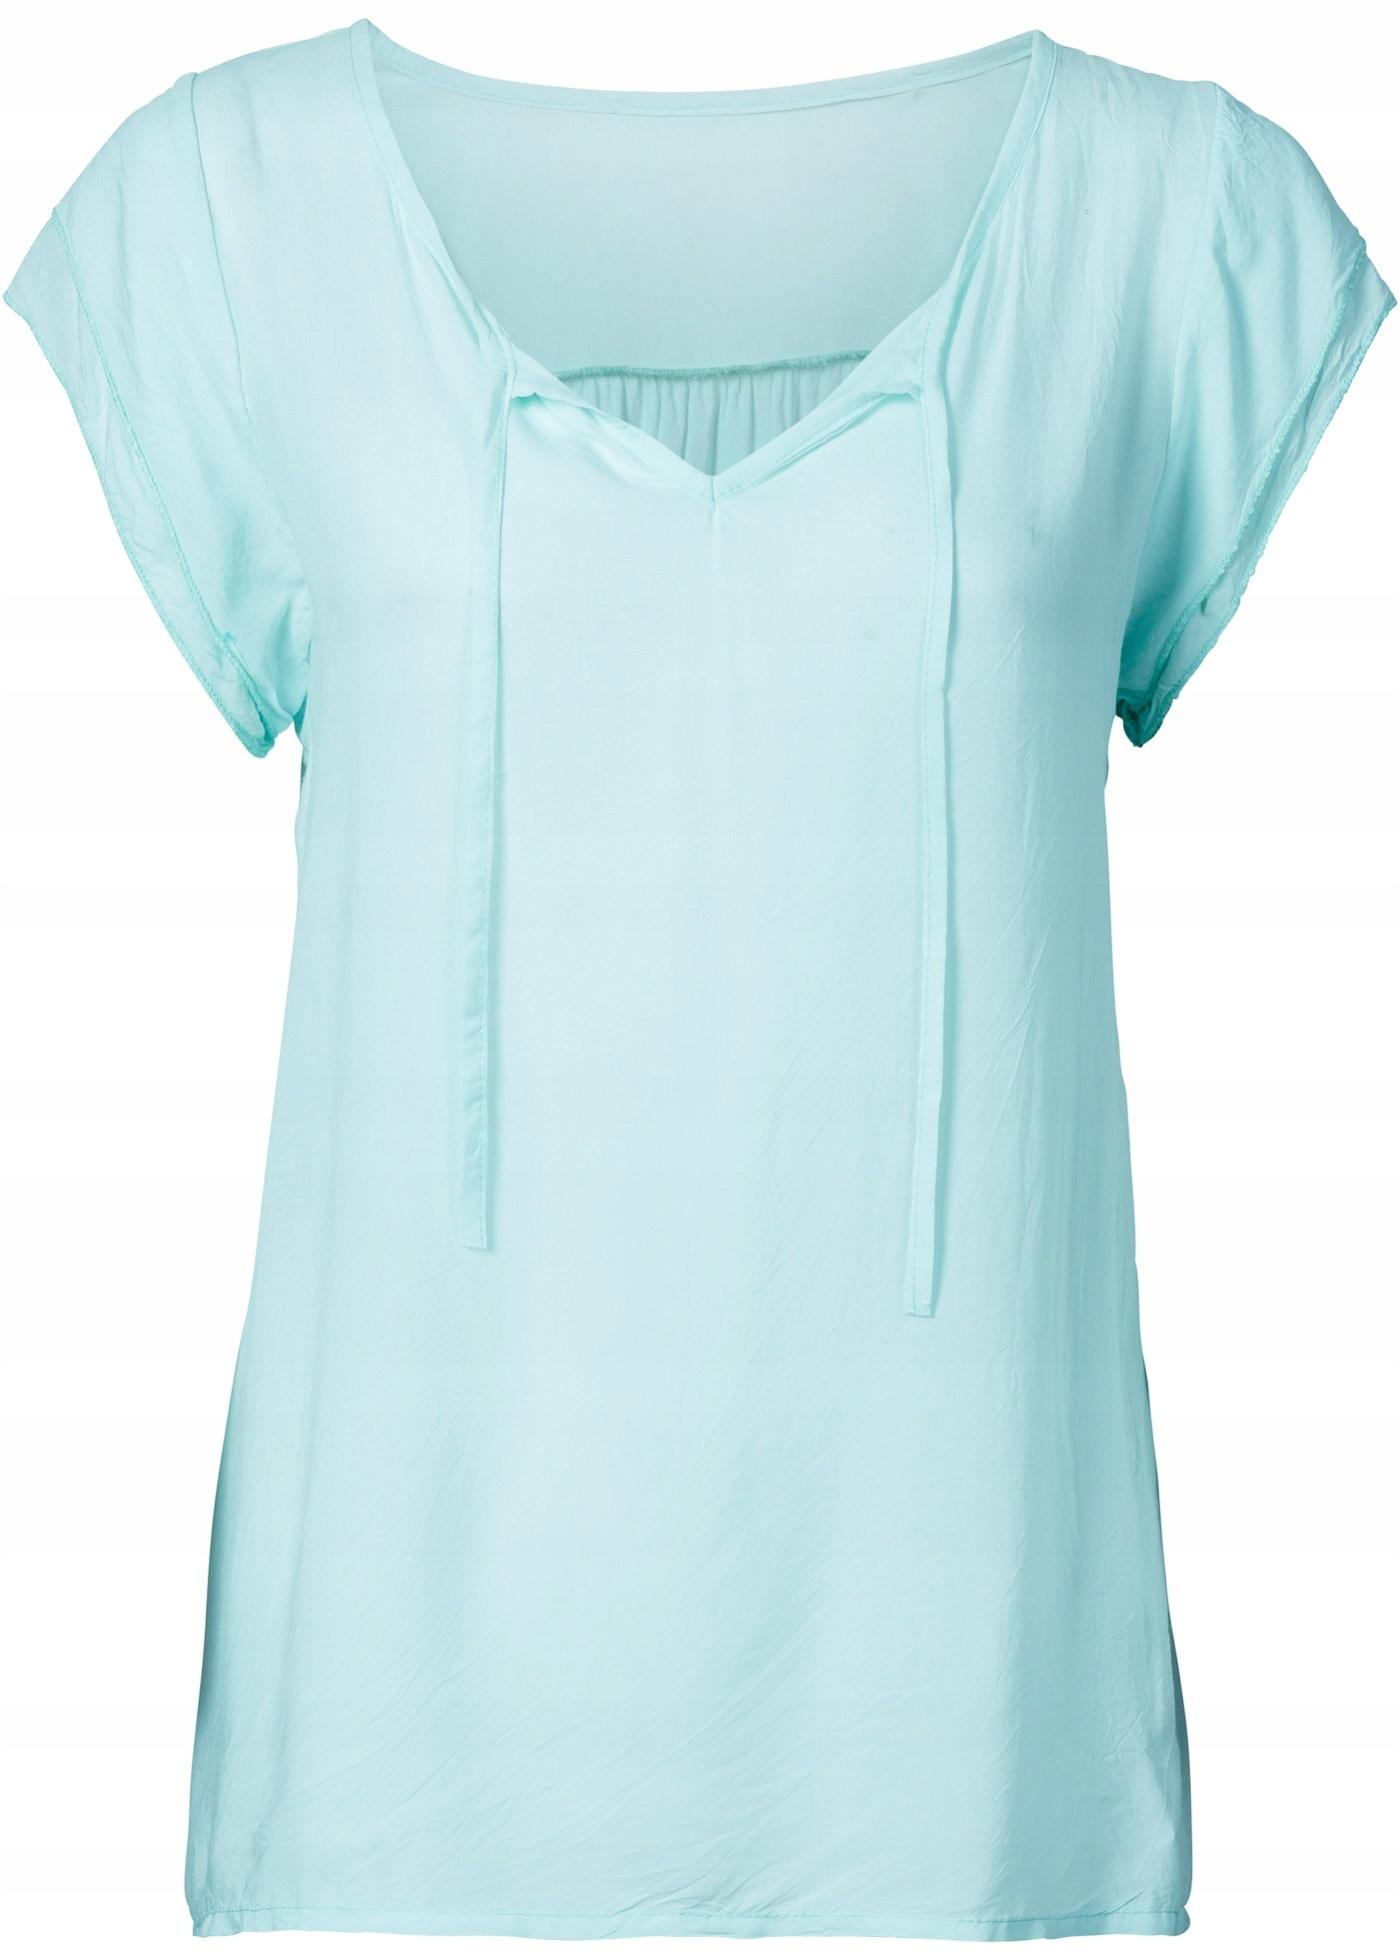 Bluzka elegancka,delikatna turkusowa R 46